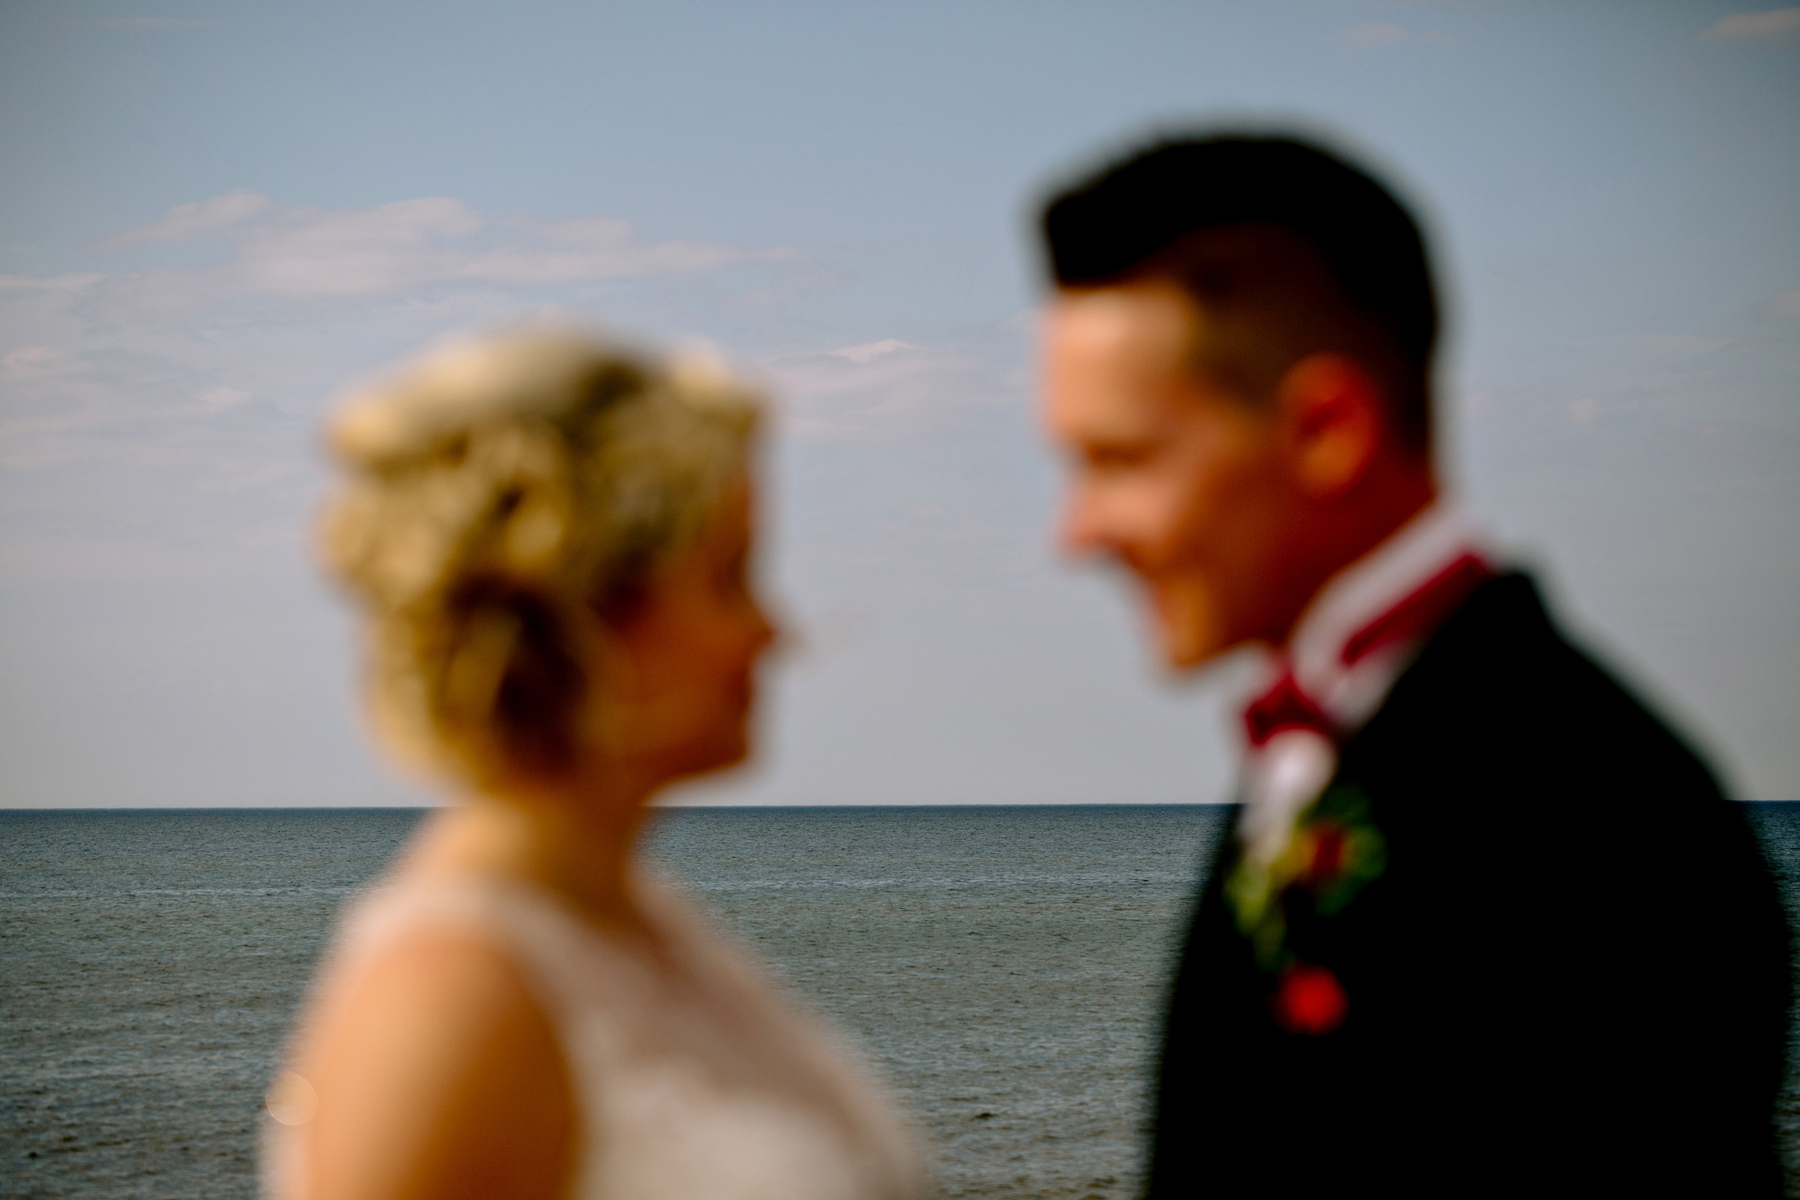 038-awesome-pei-wedding-photography-kandisebrown-jg2016